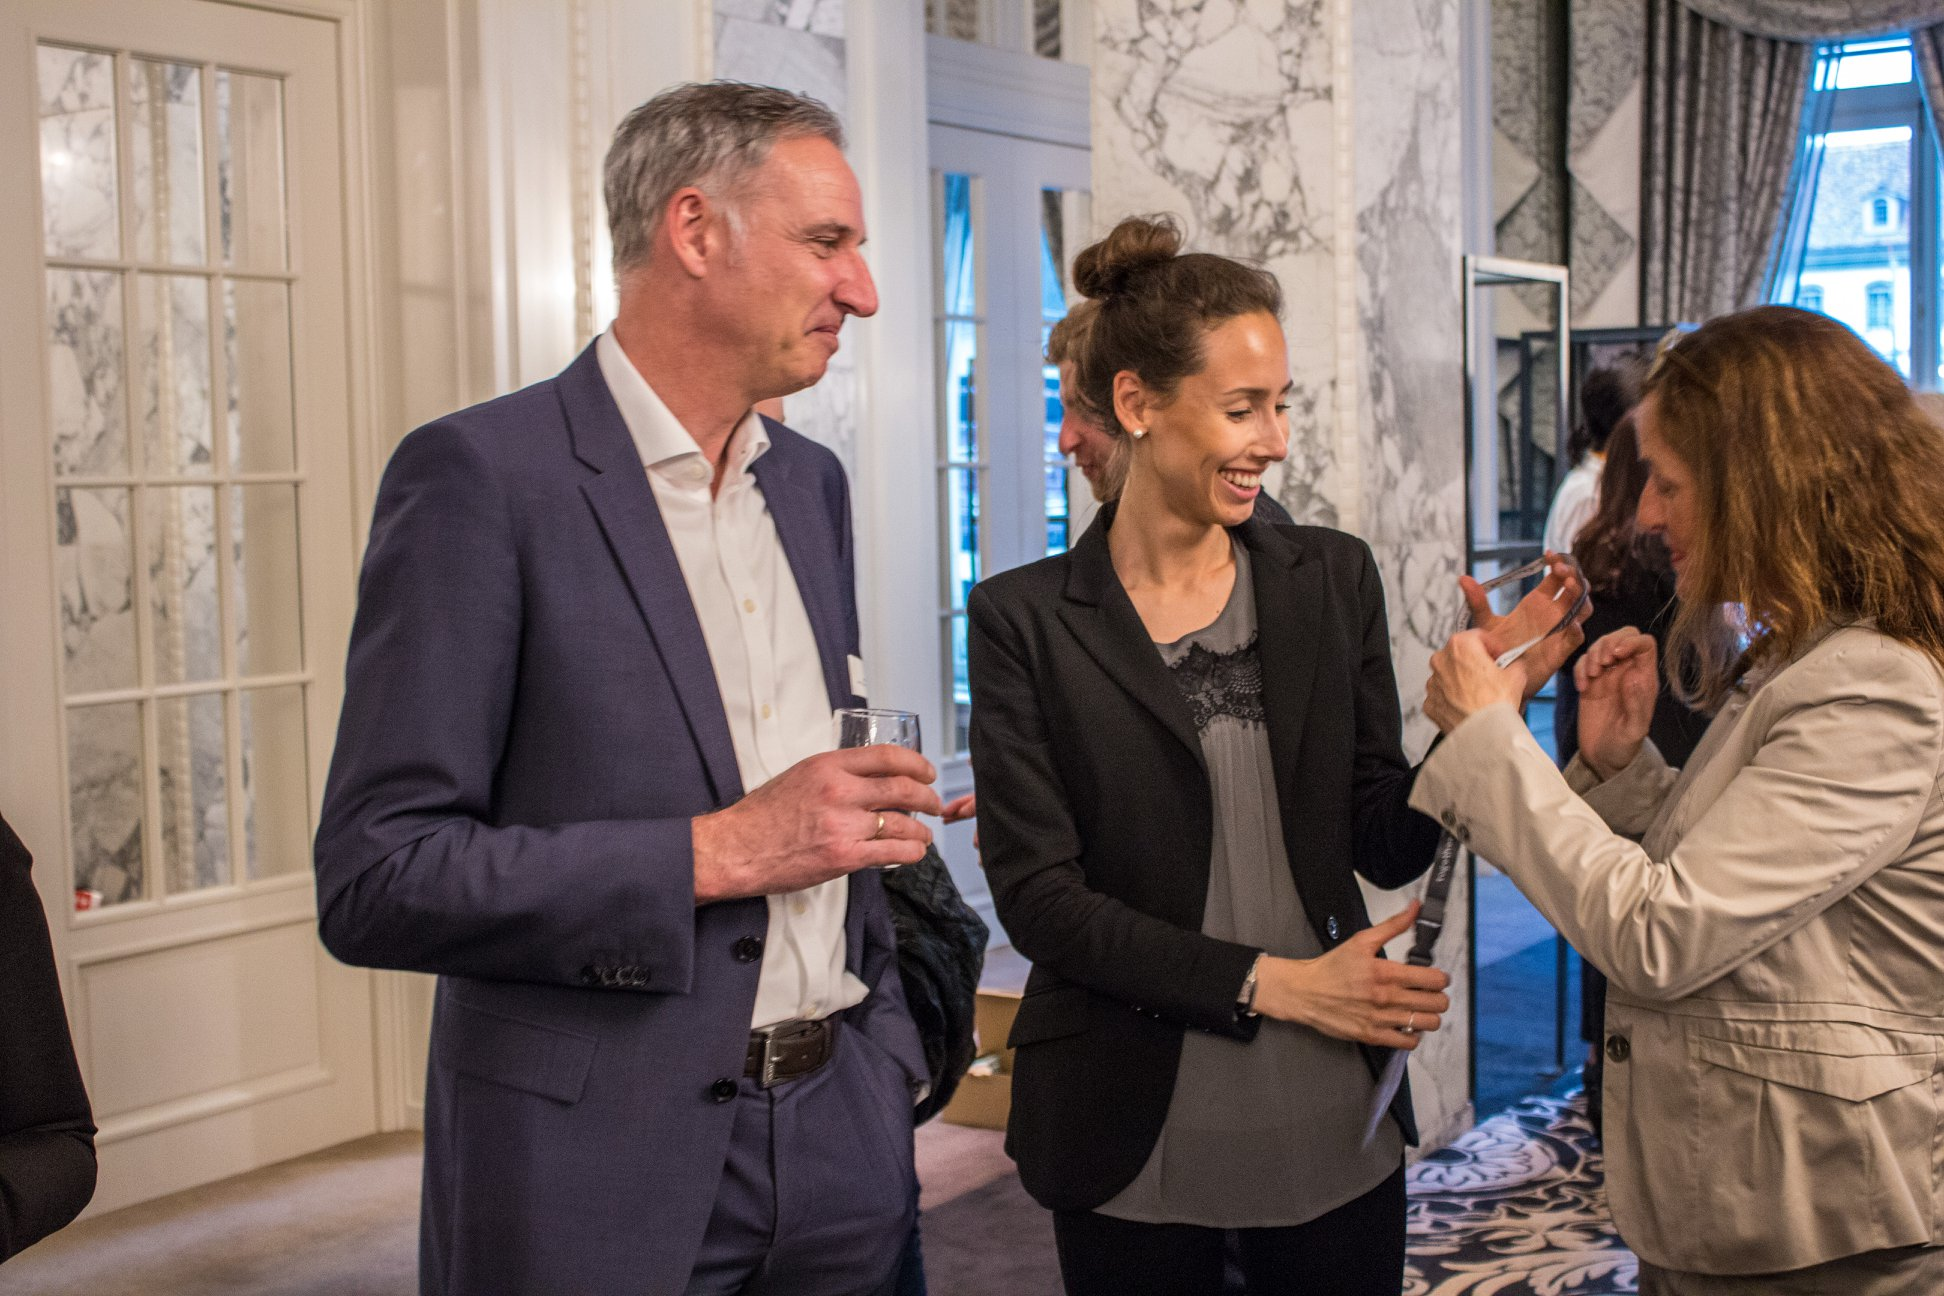 Sprungbrett-Event Bern 2018